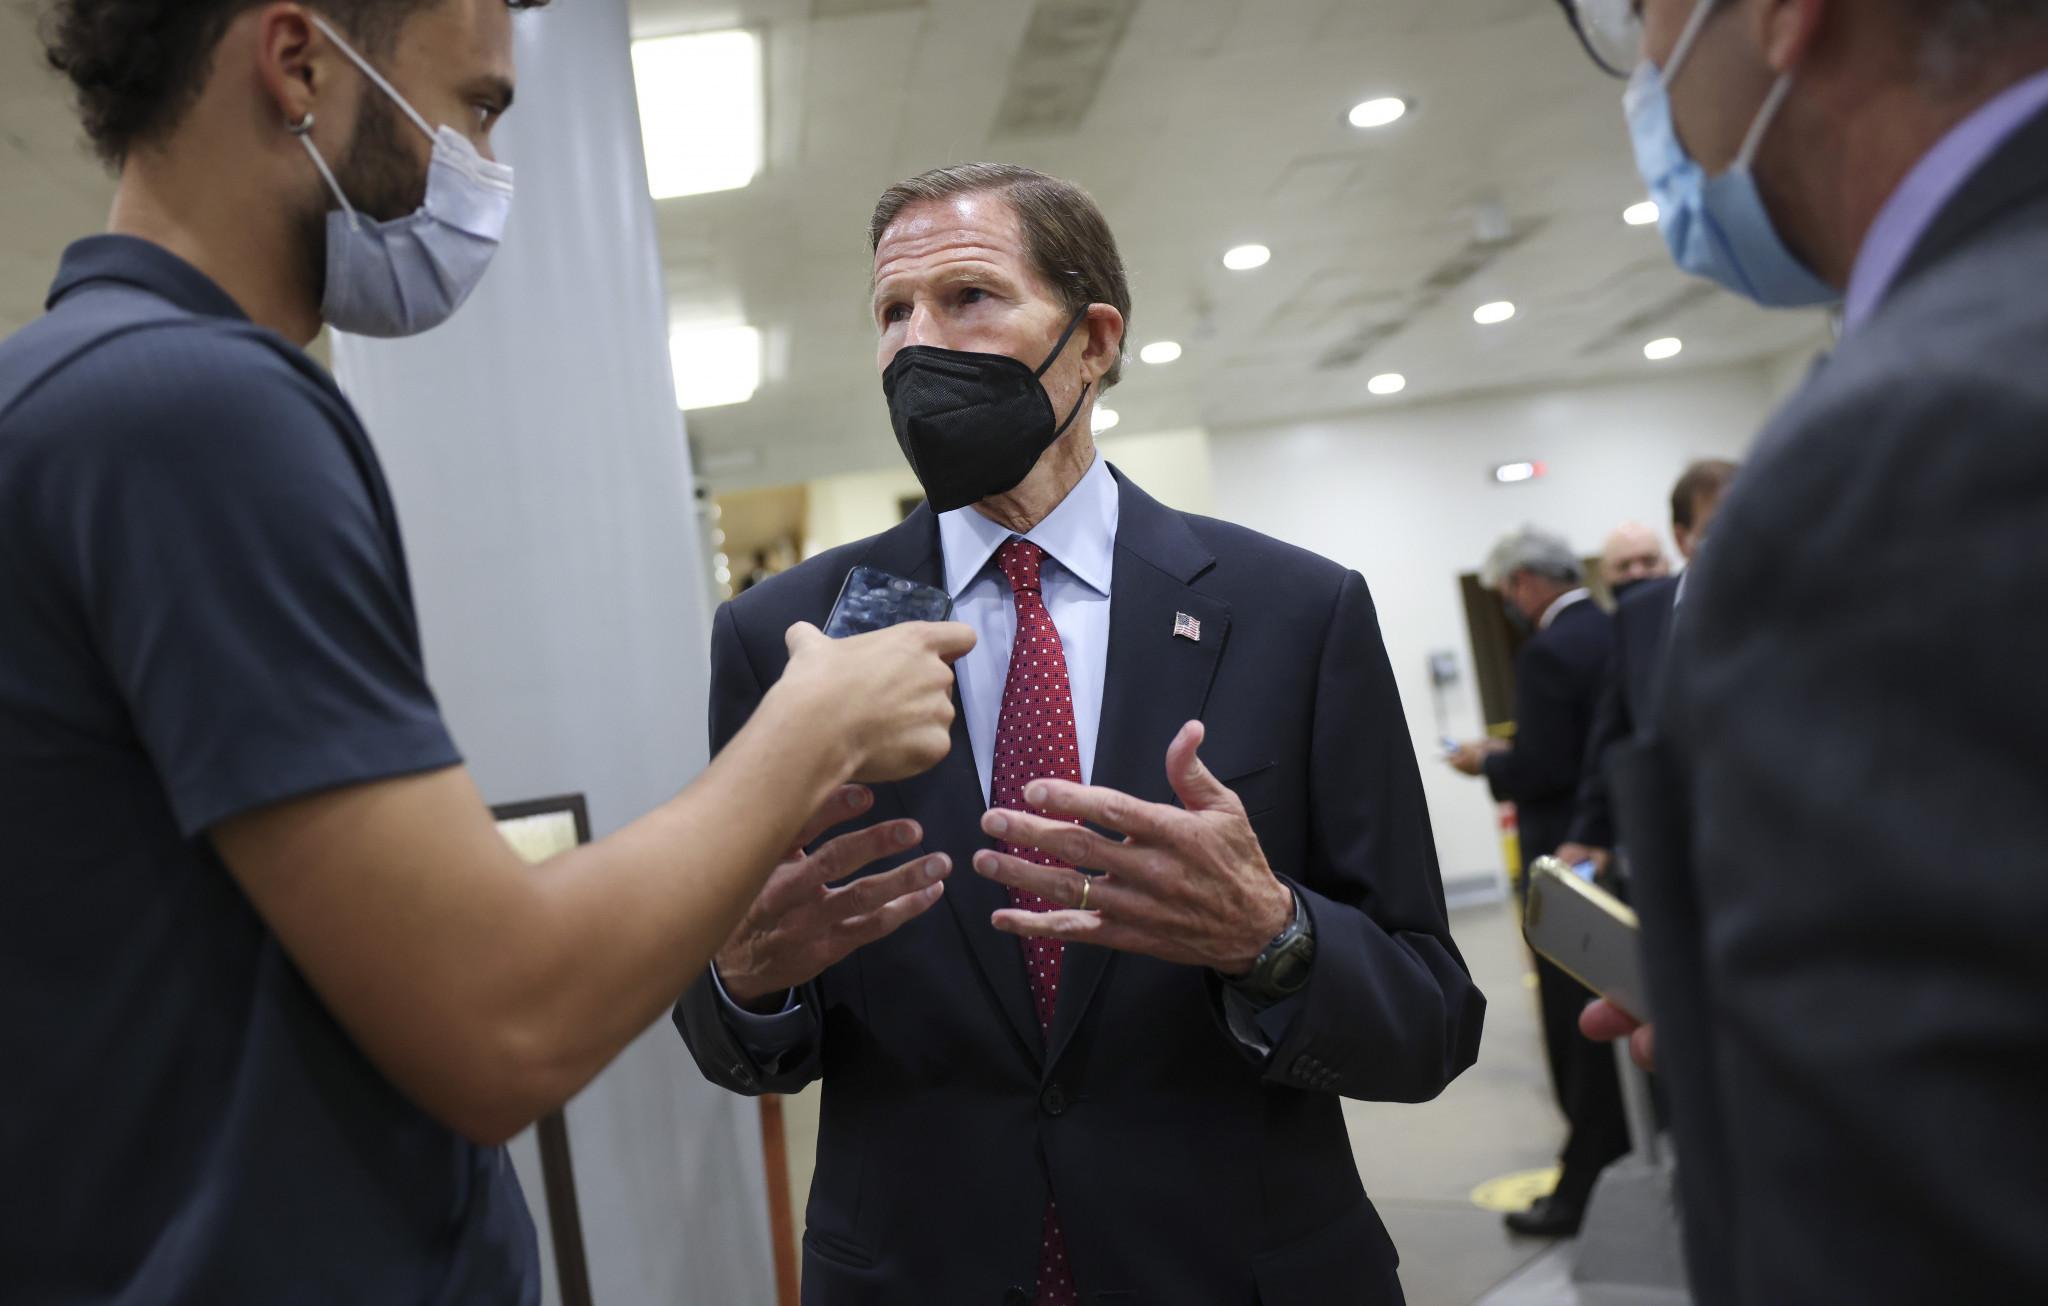 Senator Richard Blumenthal said he wanted to ensure the USOPC was